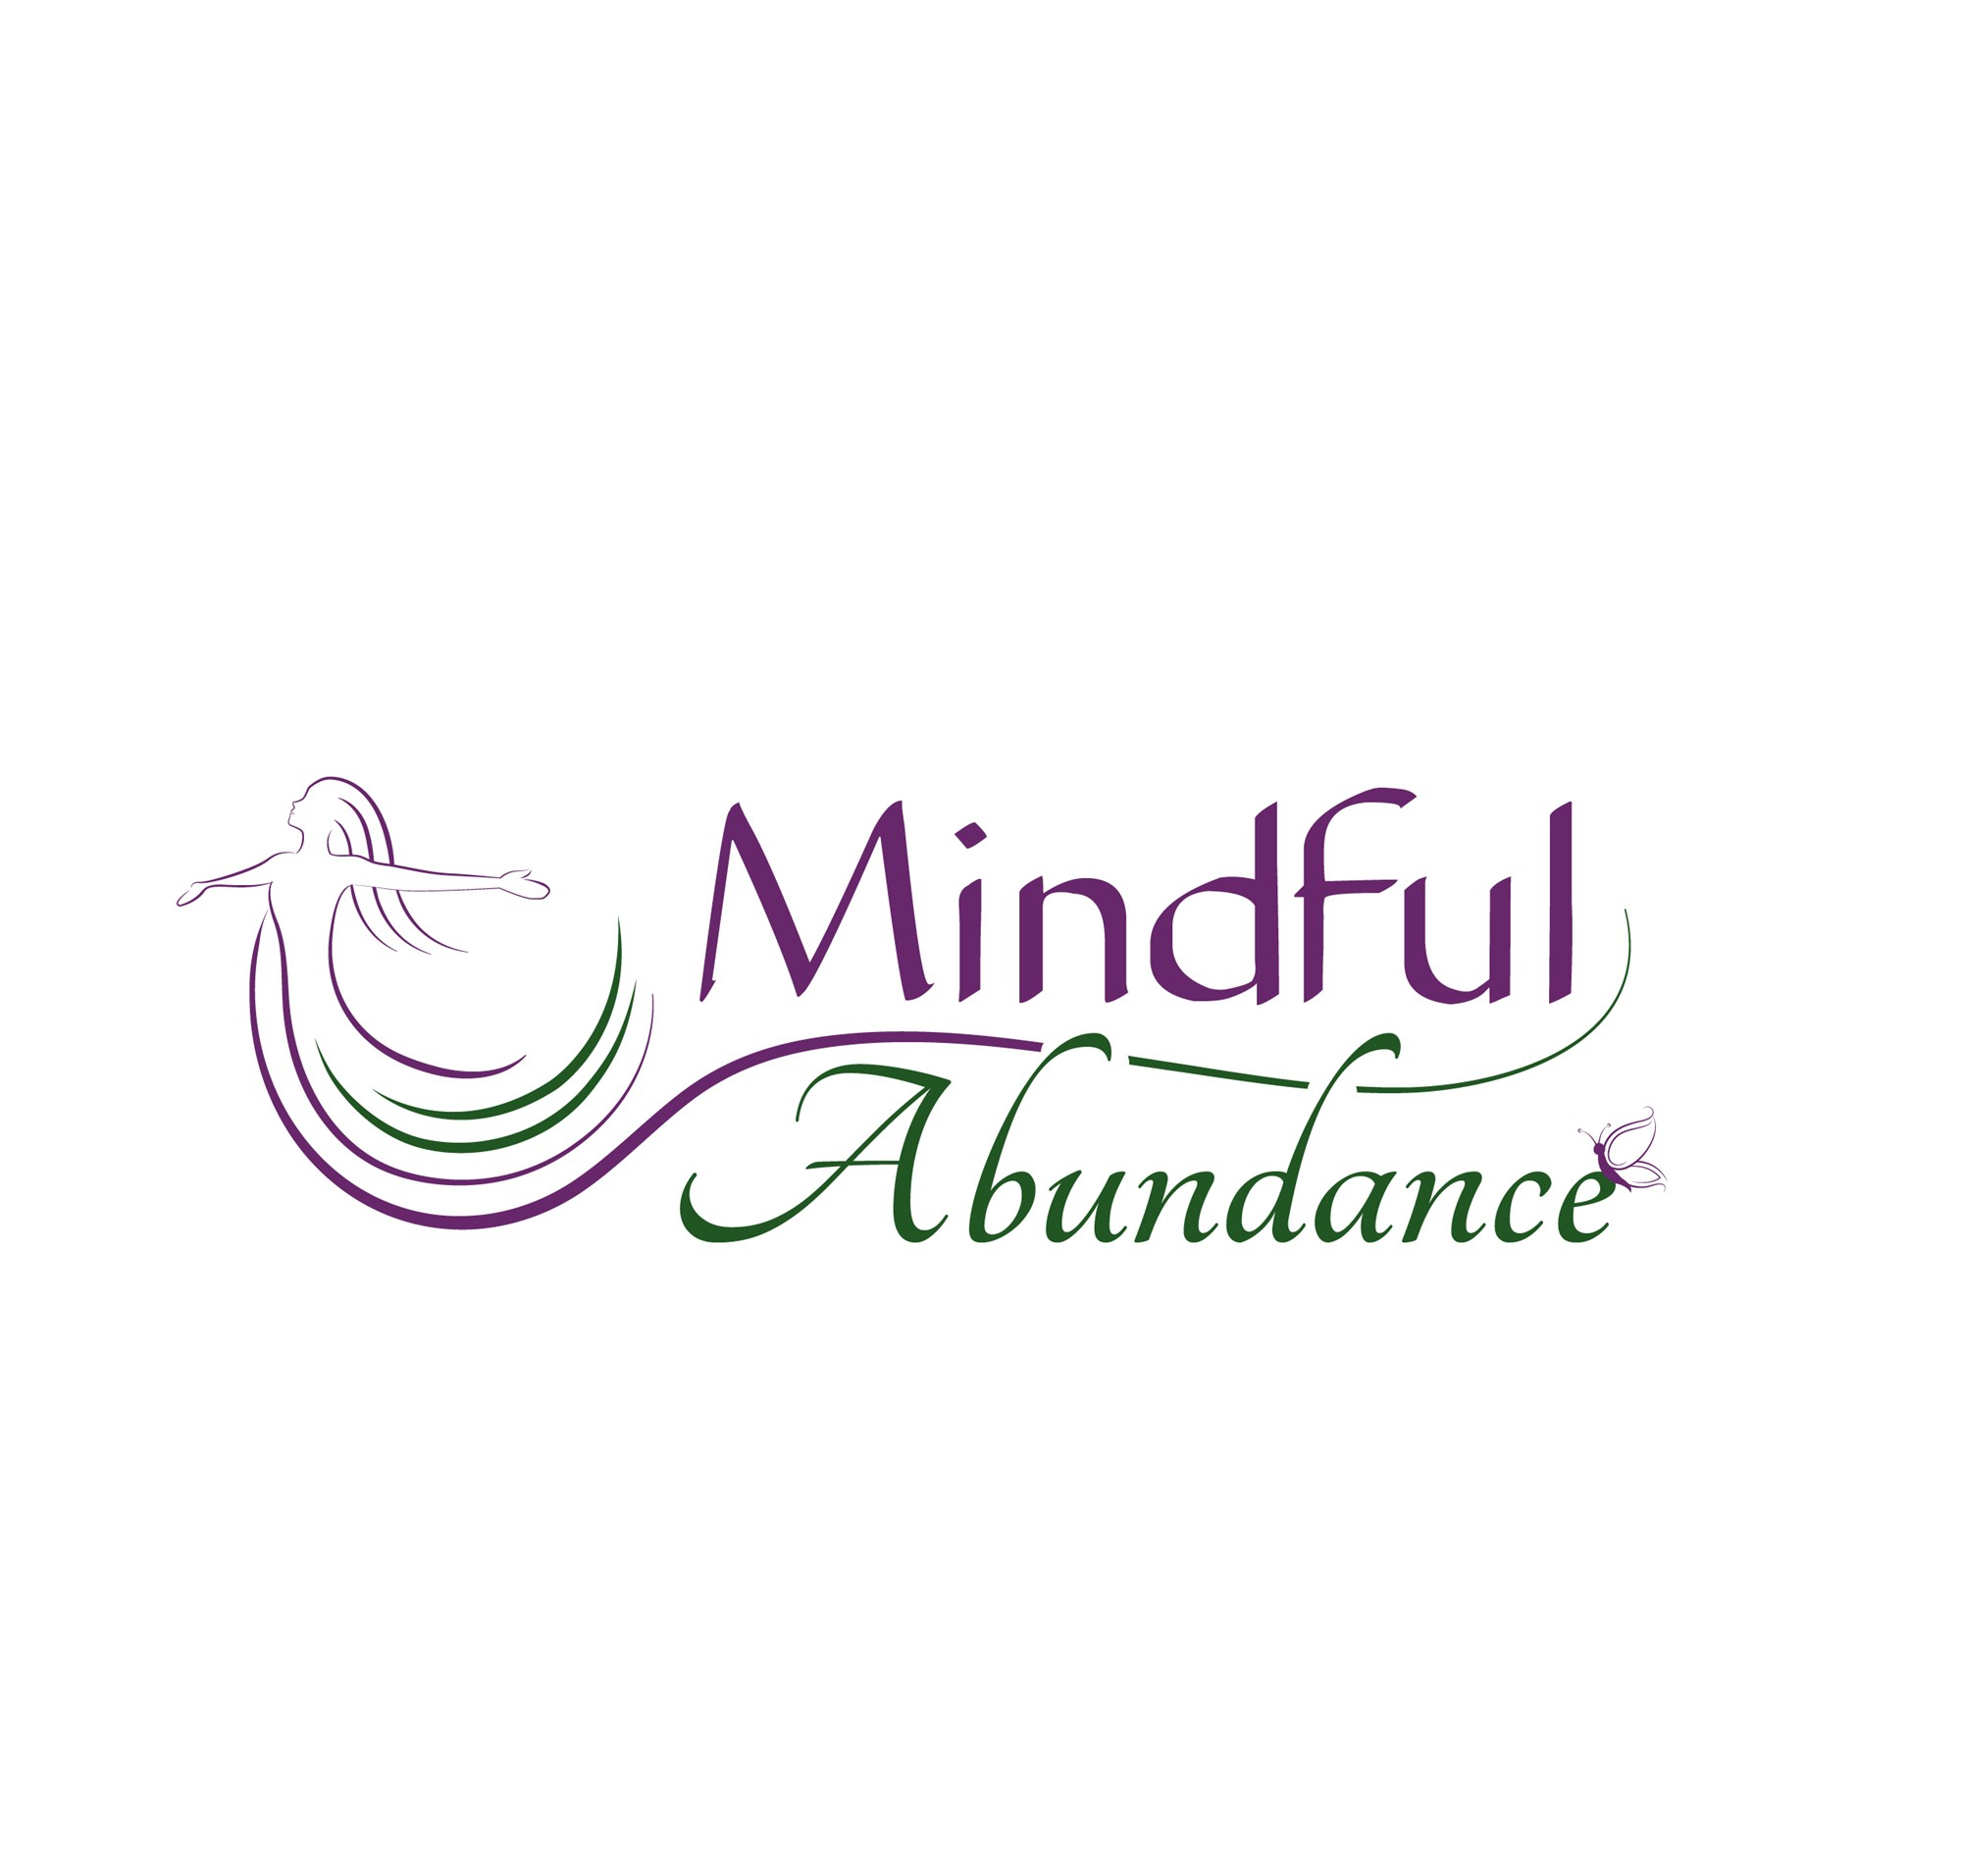 New logo wanted for Mindful Abundance